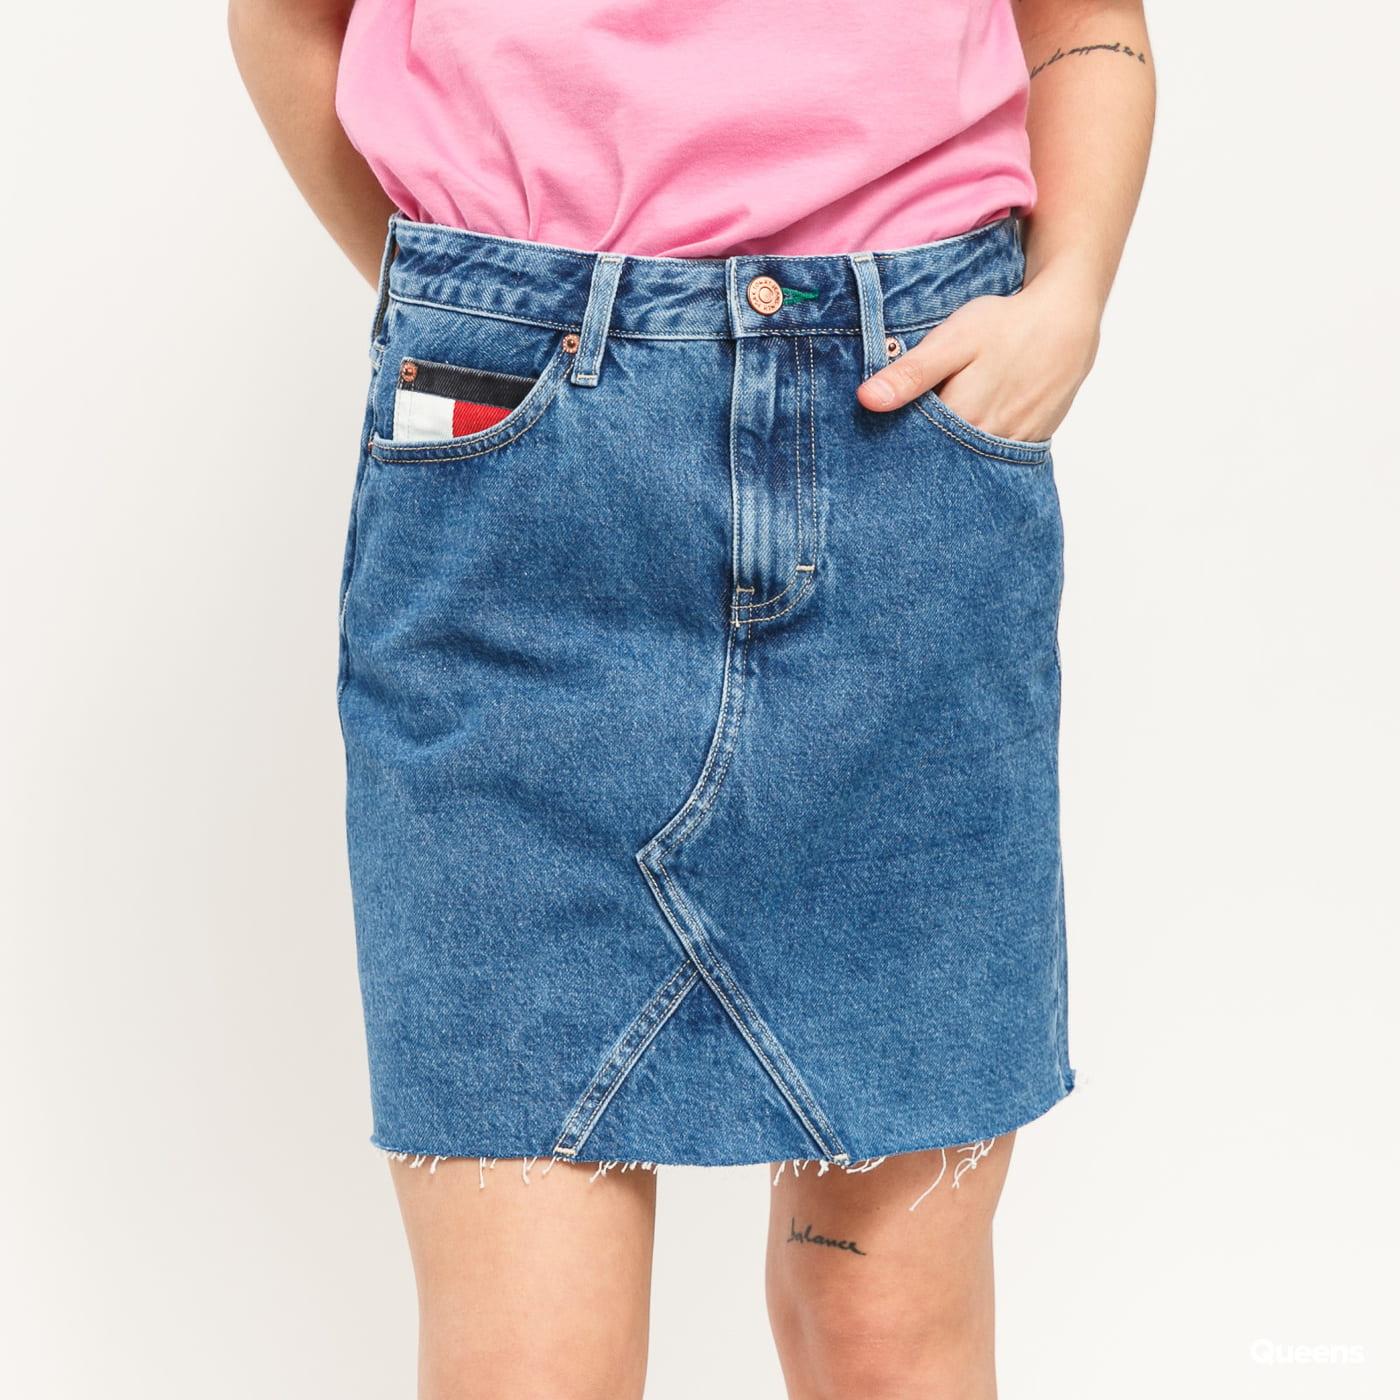 TOMMY JEANS W Short Denim Skirt save 20 mid bl rig